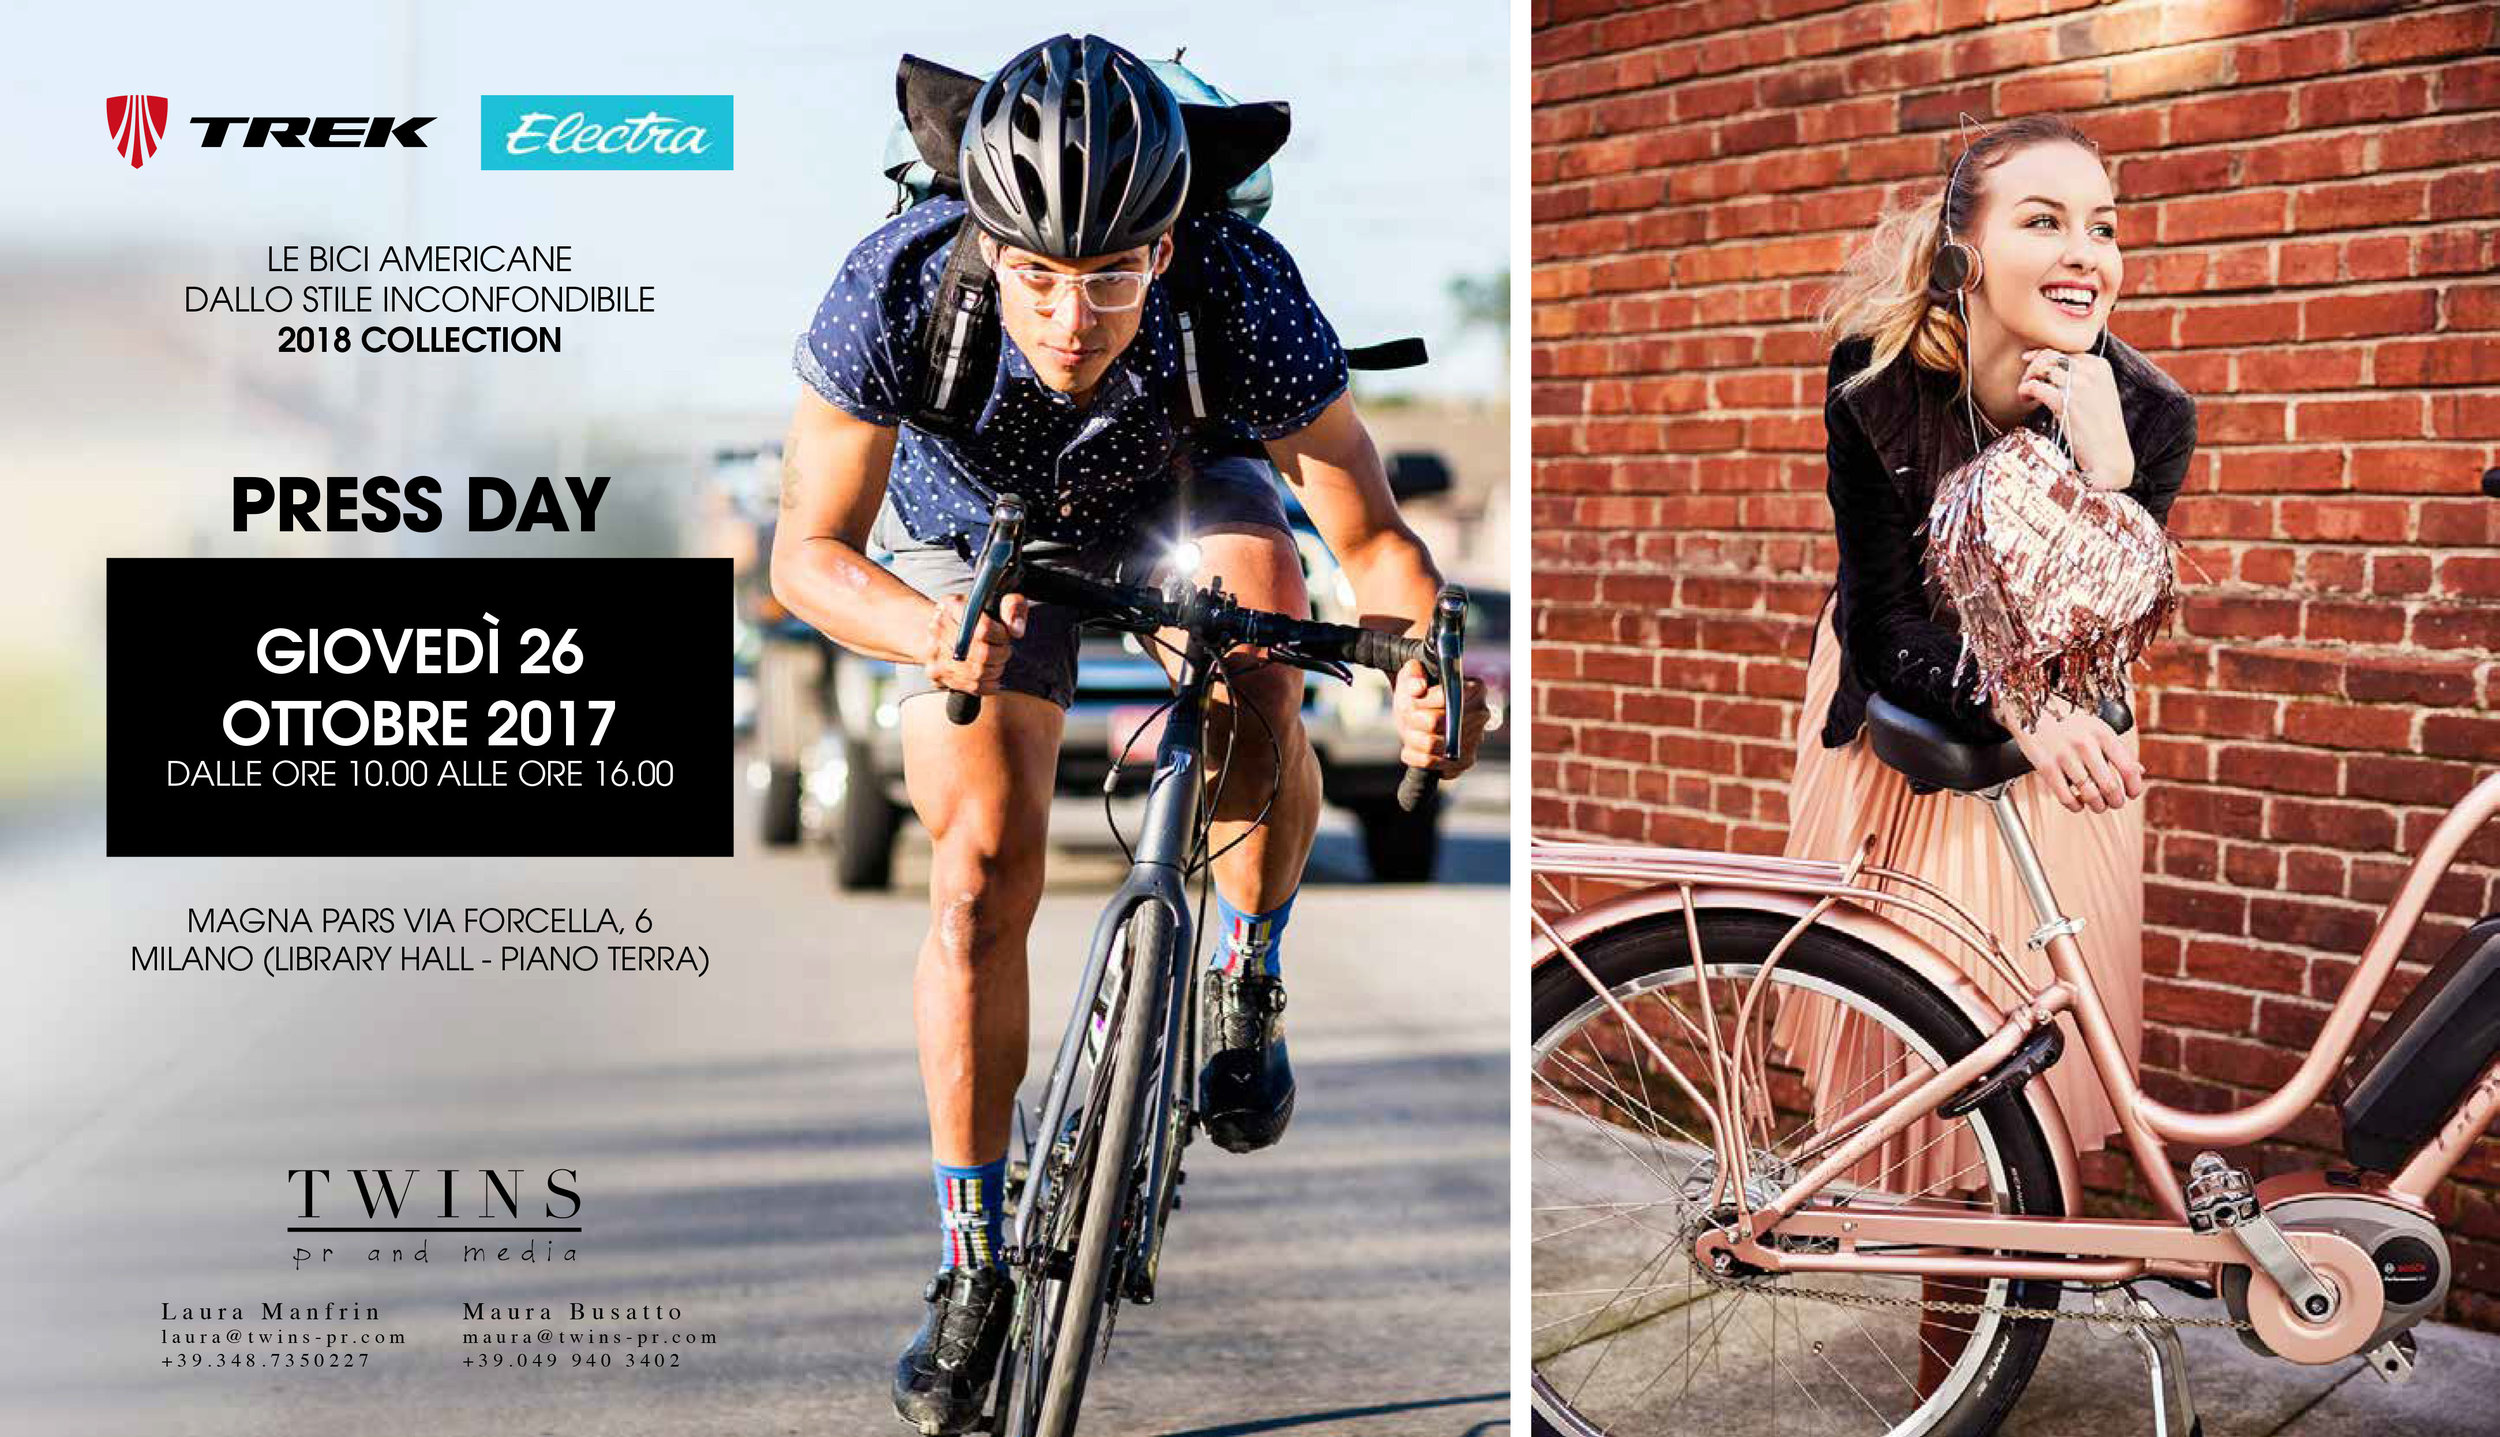 TREK_ELECTRA Press Day_INVITO_20171017 (trascinato).jpg